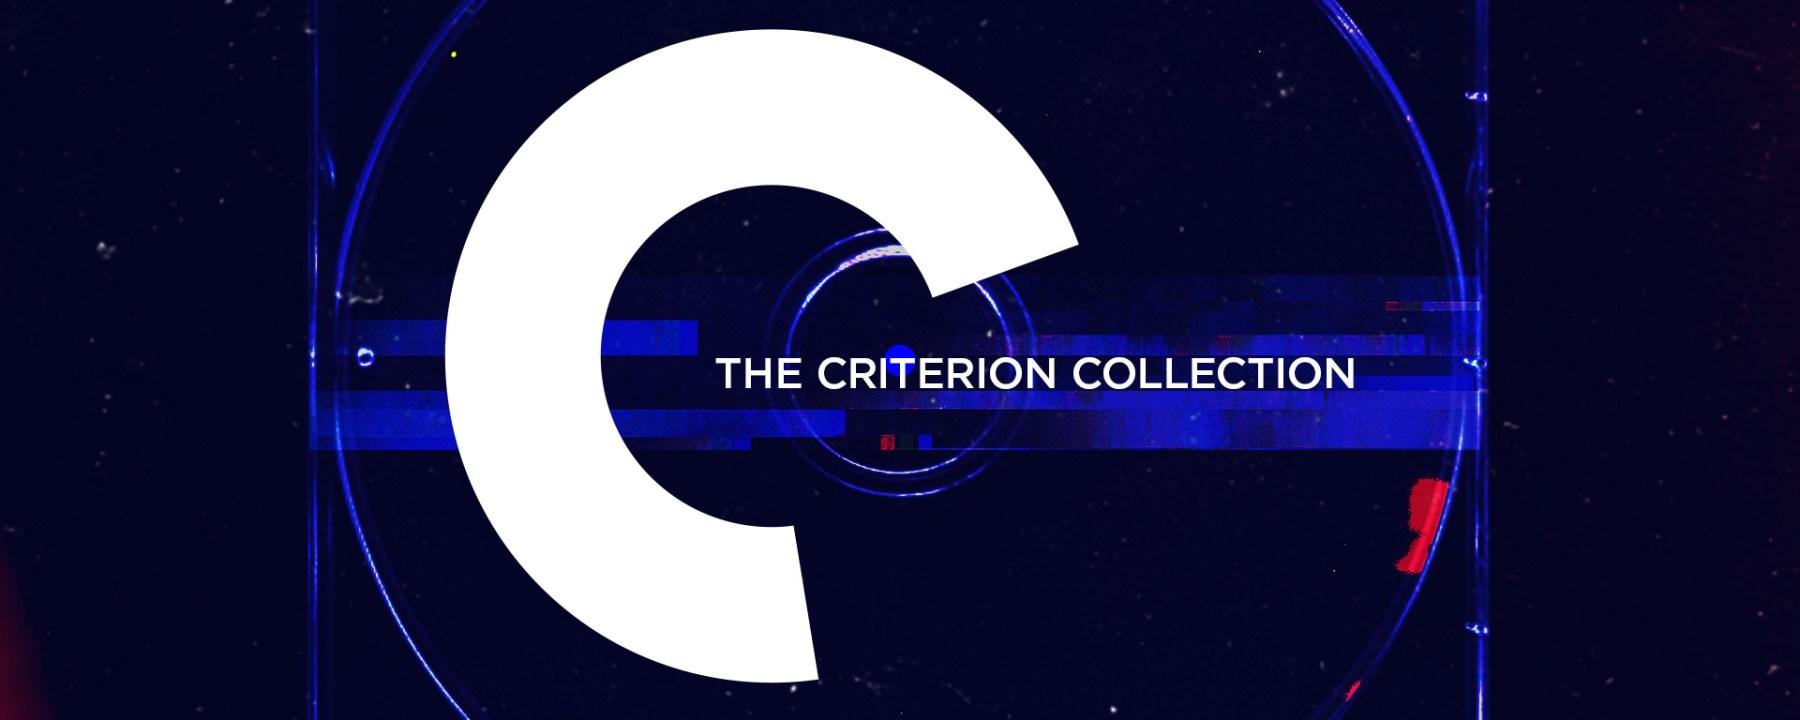 la historia de criterion collection